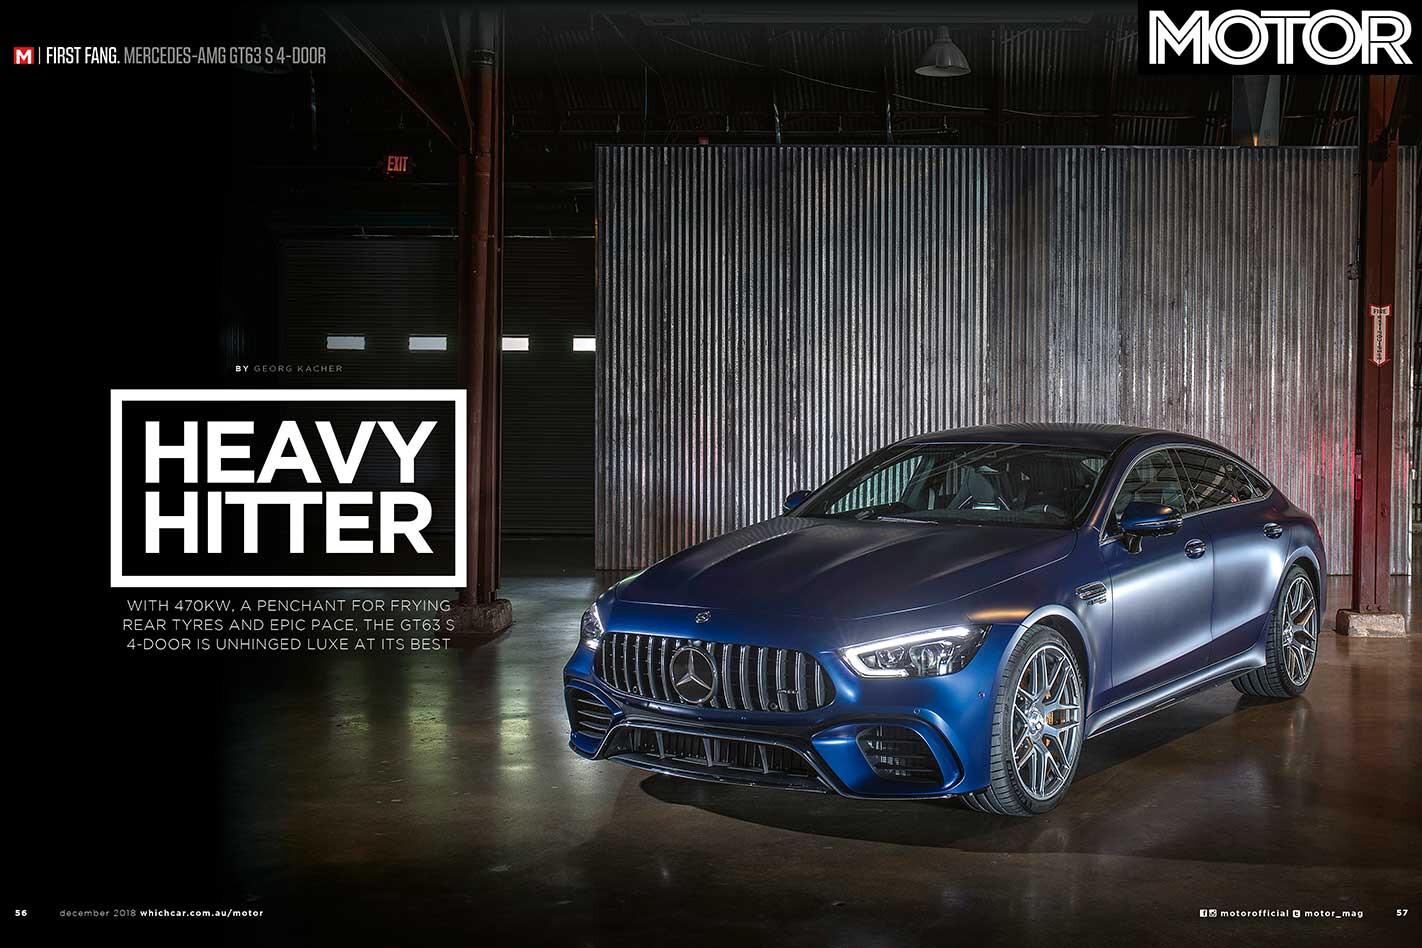 MOTOR Magazine December 2018 Preview GT 63 Jpg